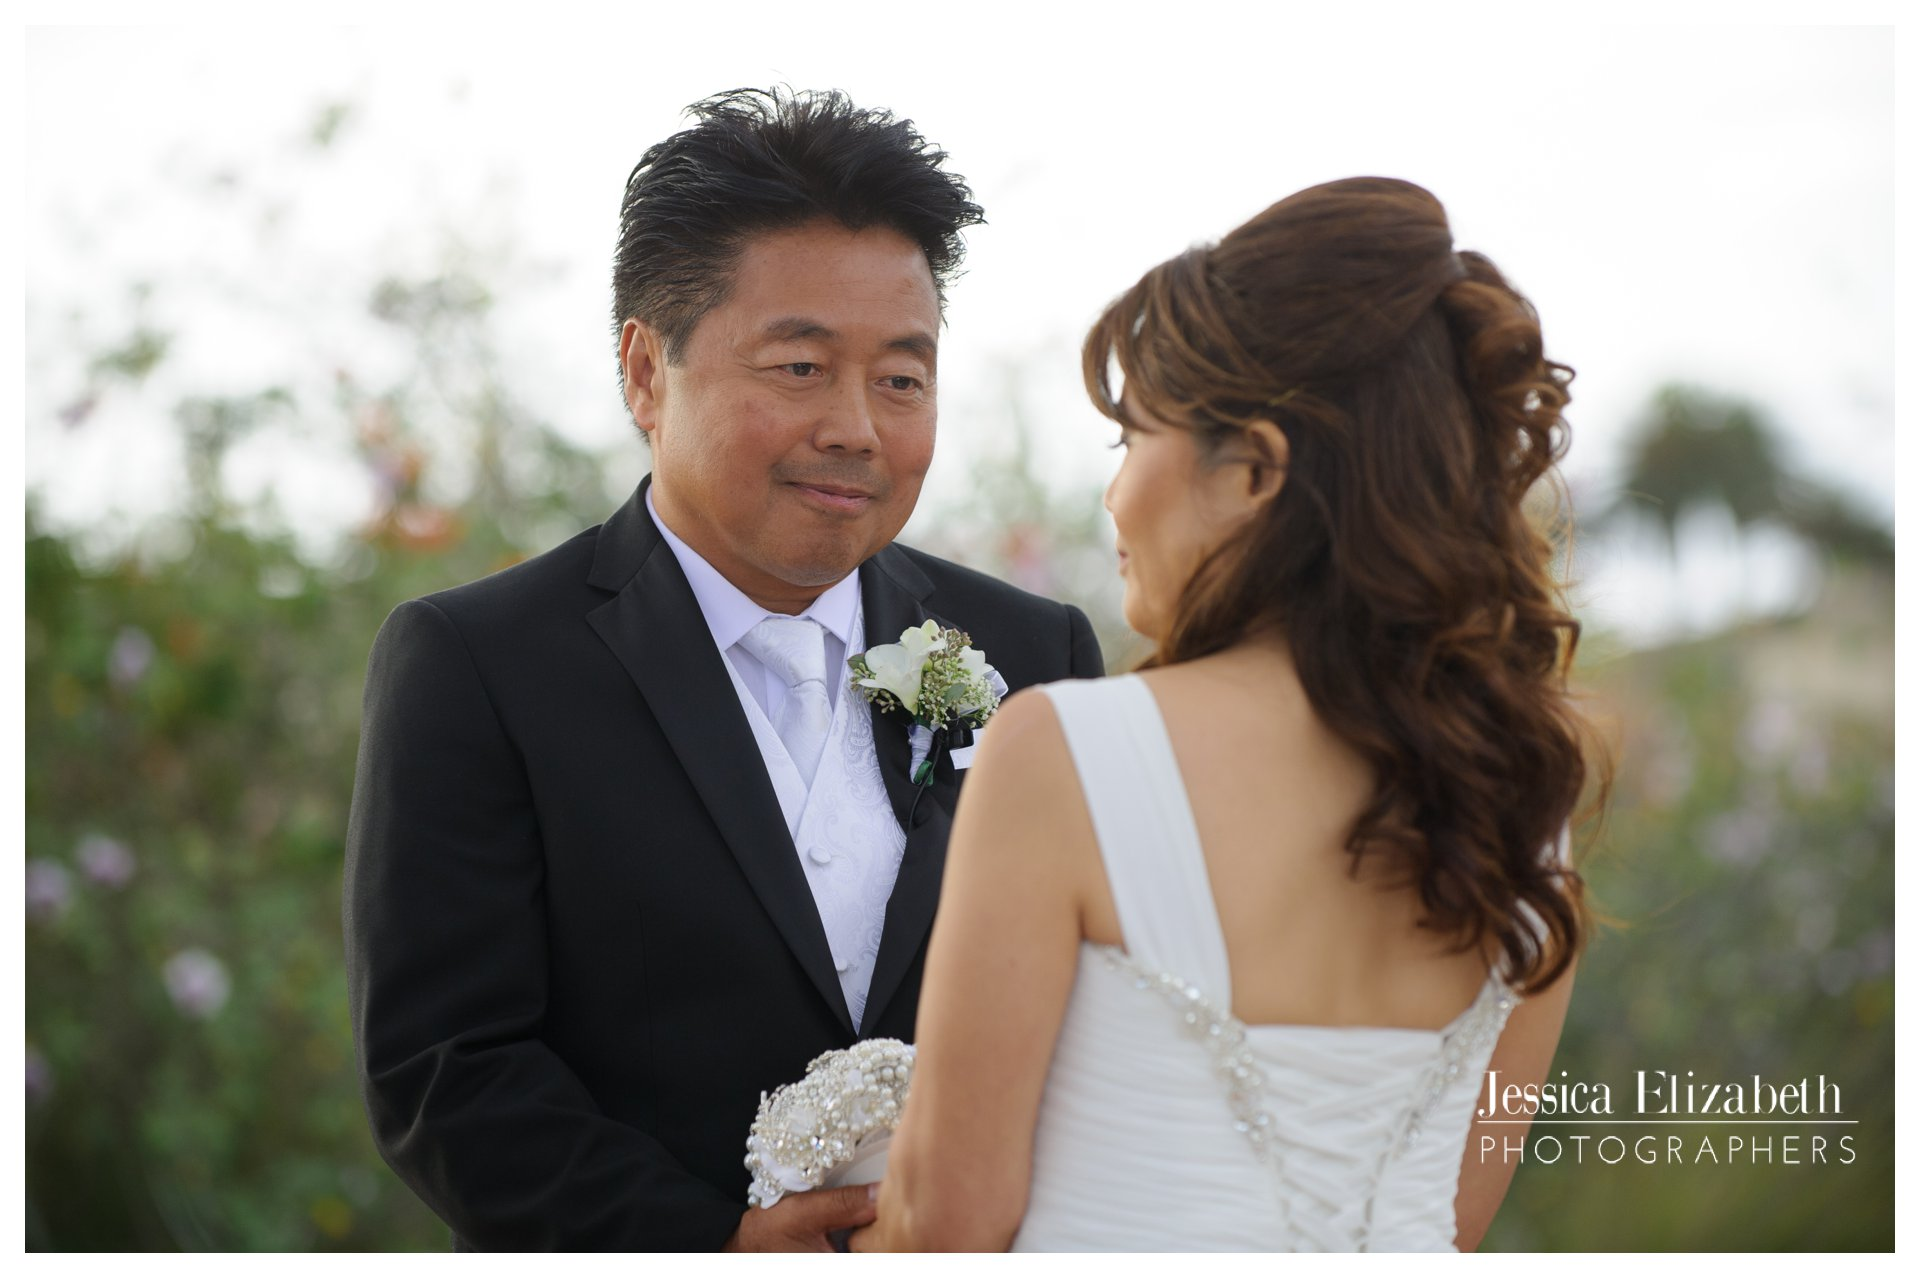 13-Terranea-Palos-Verdes-Wedding-Photography-by-Jessica-Elizabeth-w.jpg